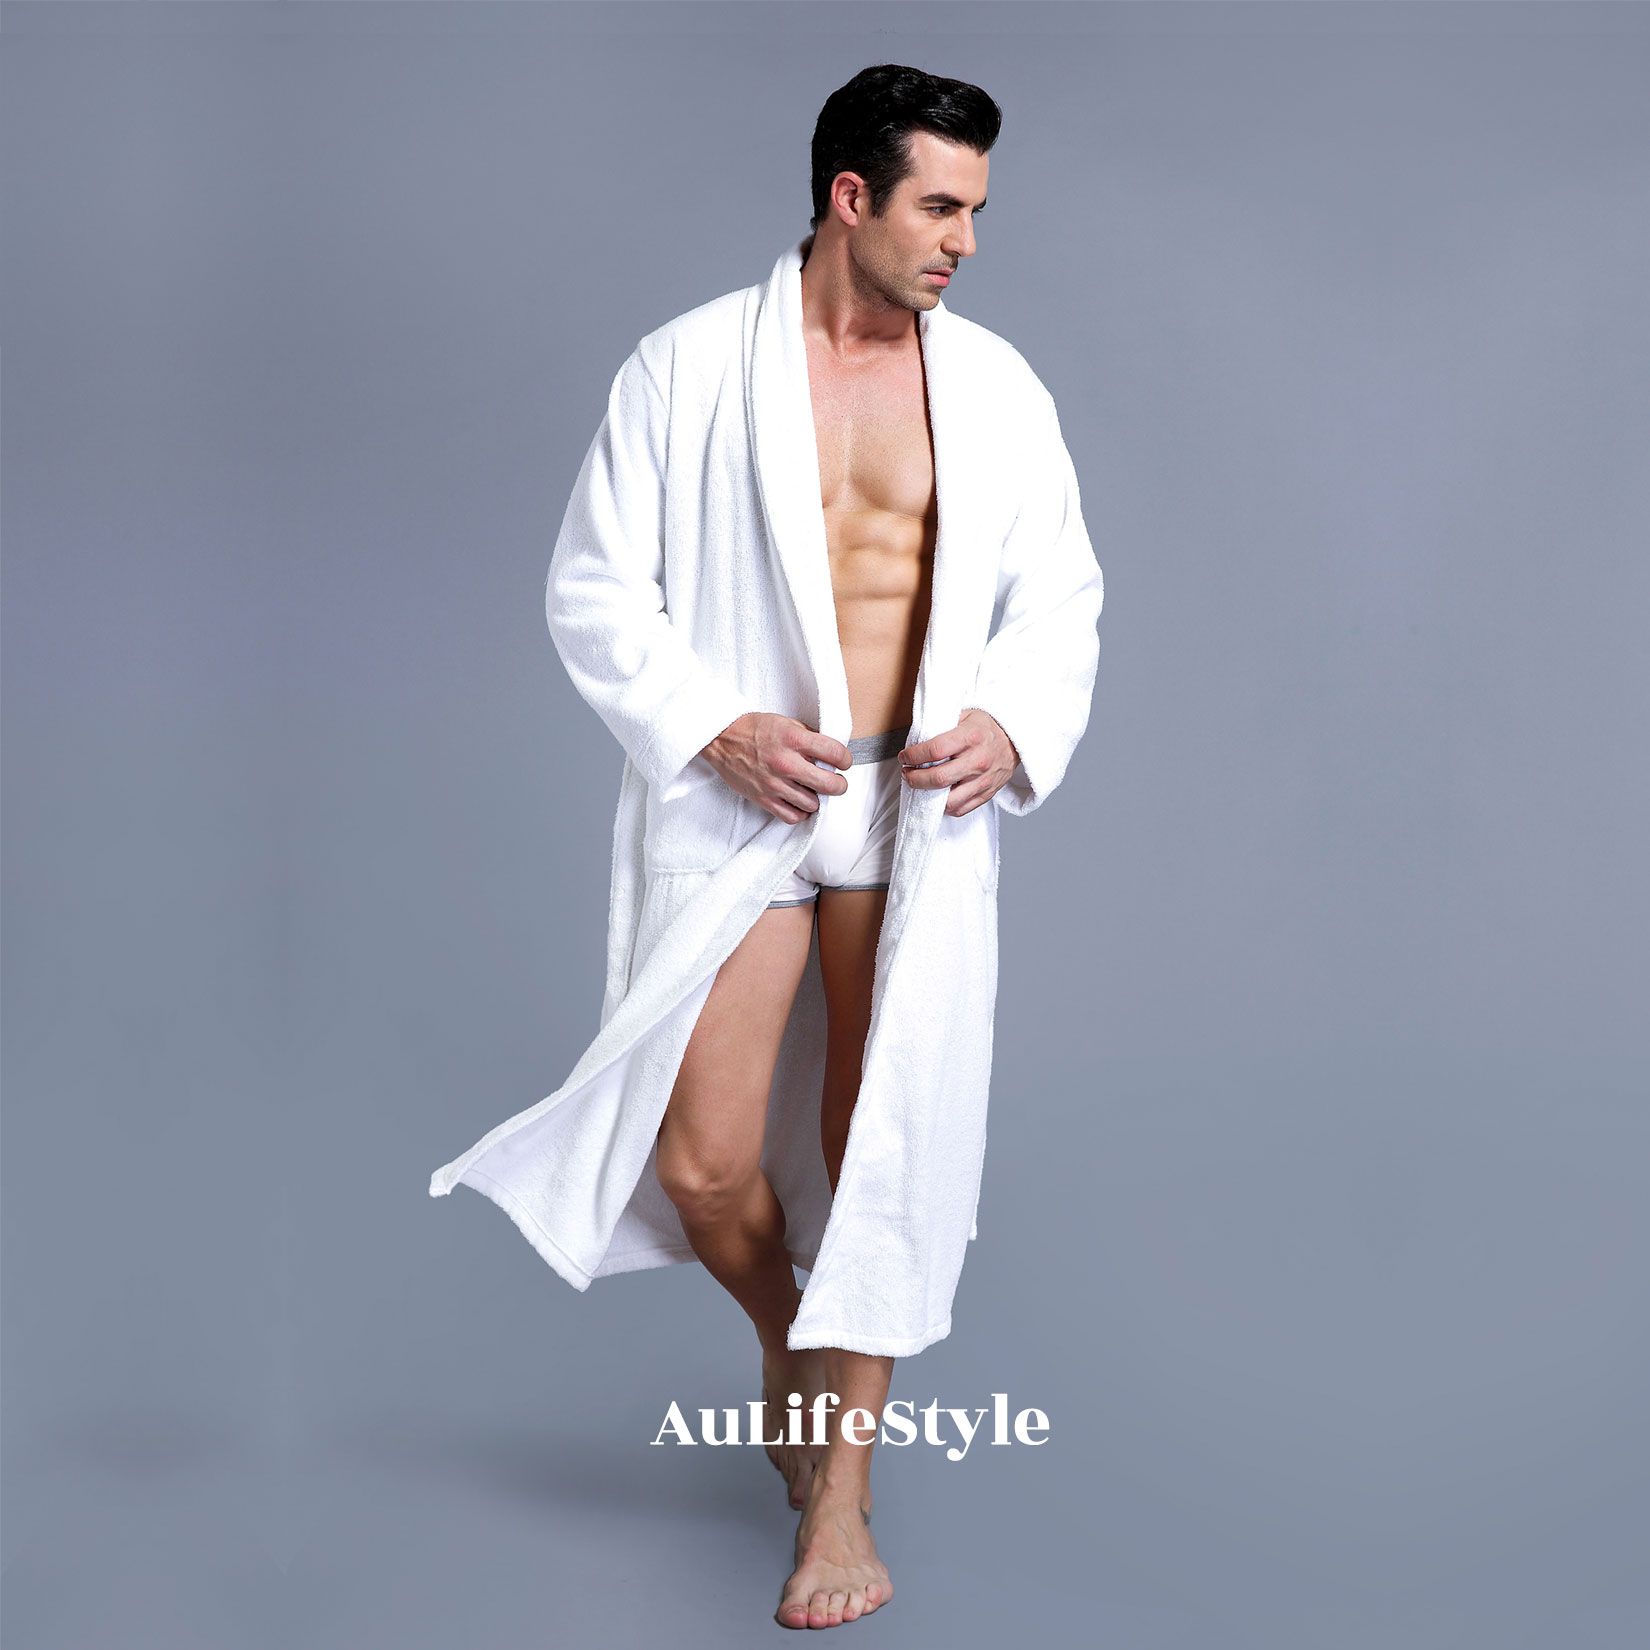 XXXL LUXURY 100% COTTON TERRY TOWELLING BATH ROBE MEN   WOMEN SOFT ... 3902b341d